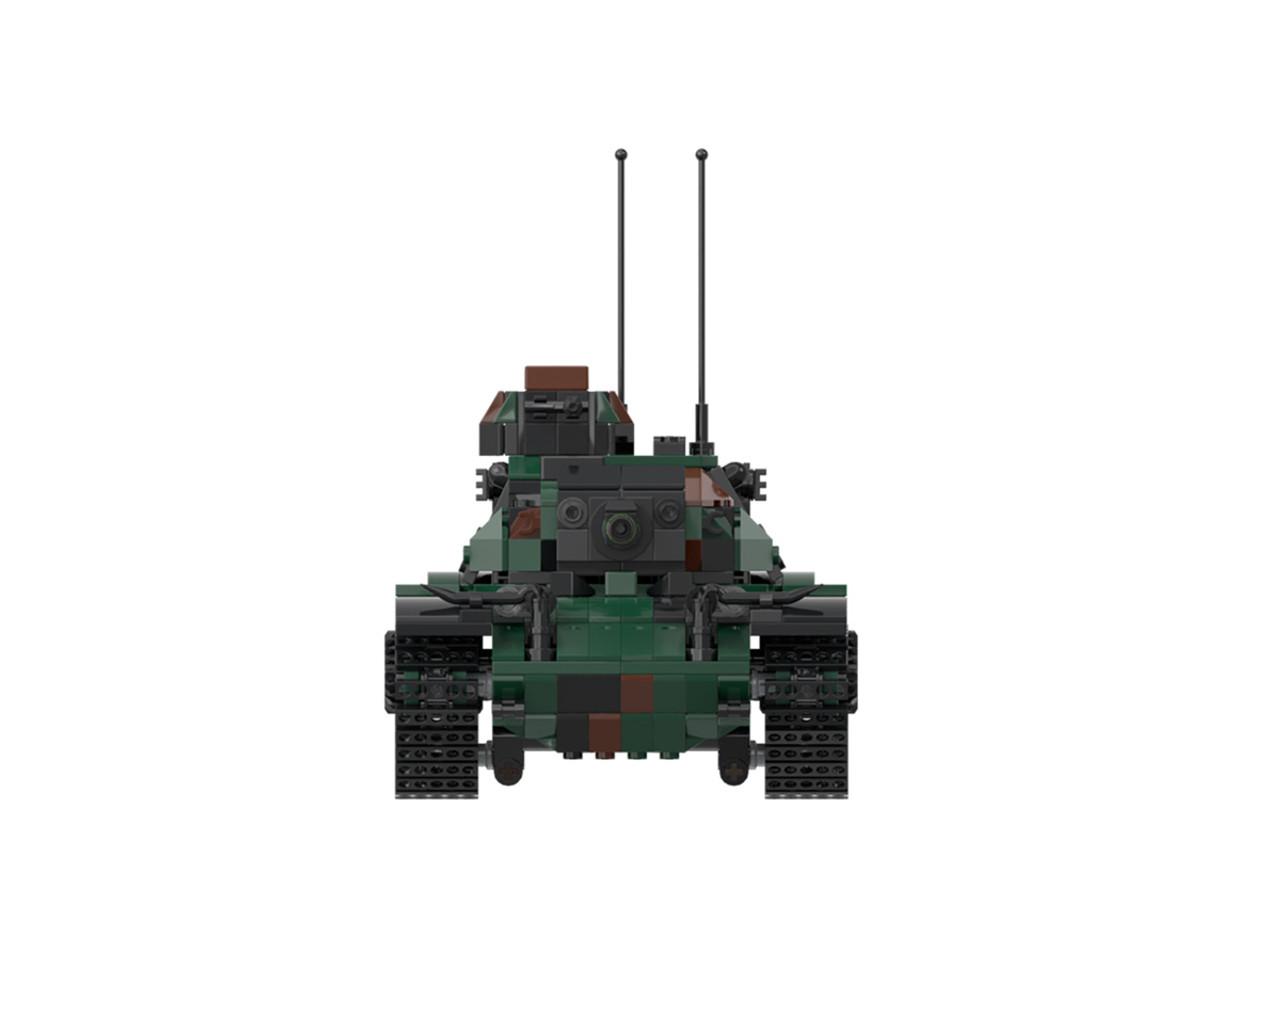 M60A3 - Main Battle Tank